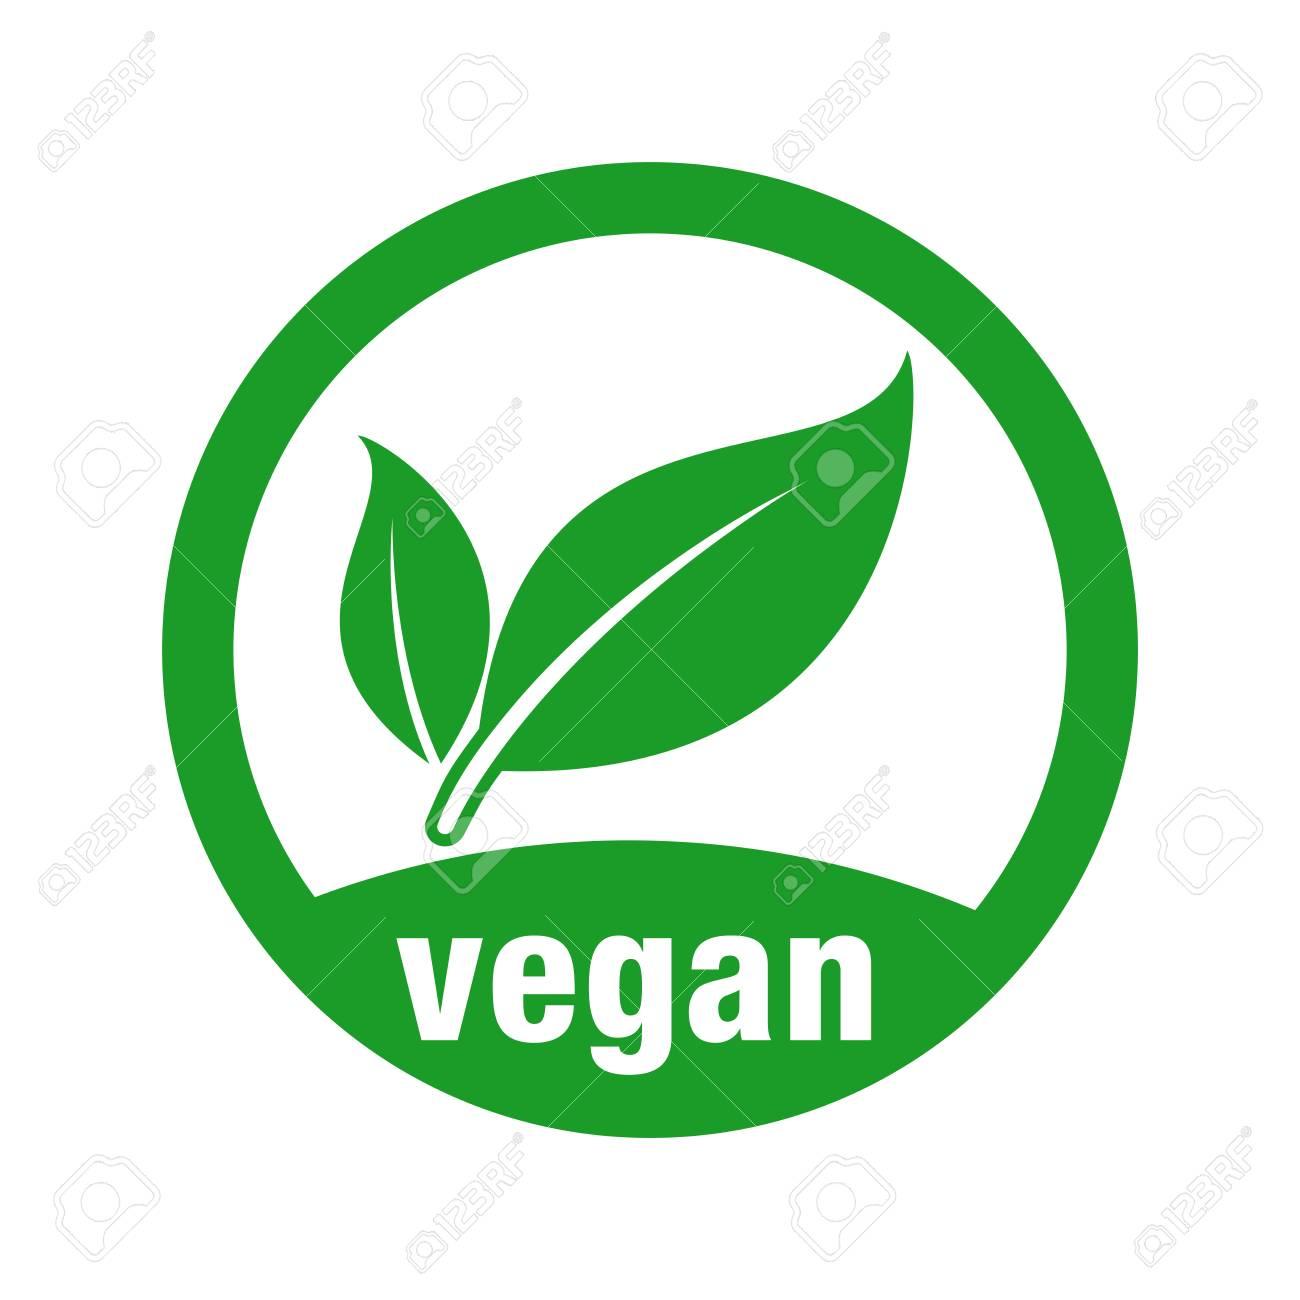 icon for vegan food